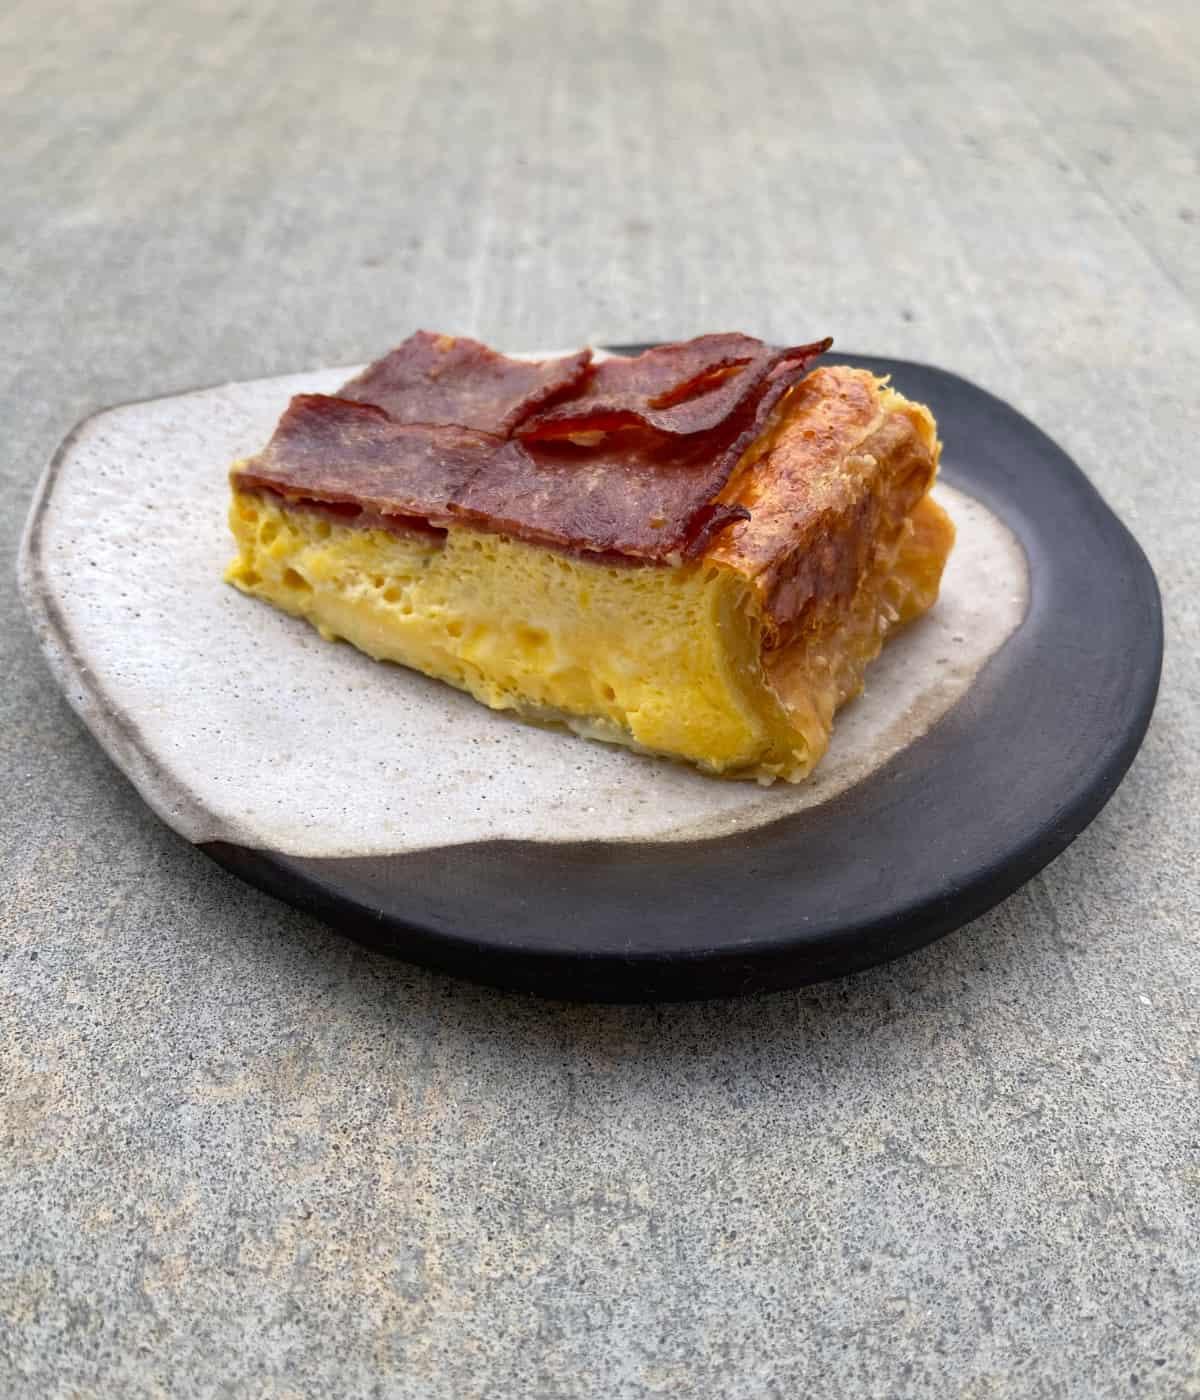 Breakfast pie topped with crispy turkey bacon on ceramic plate.